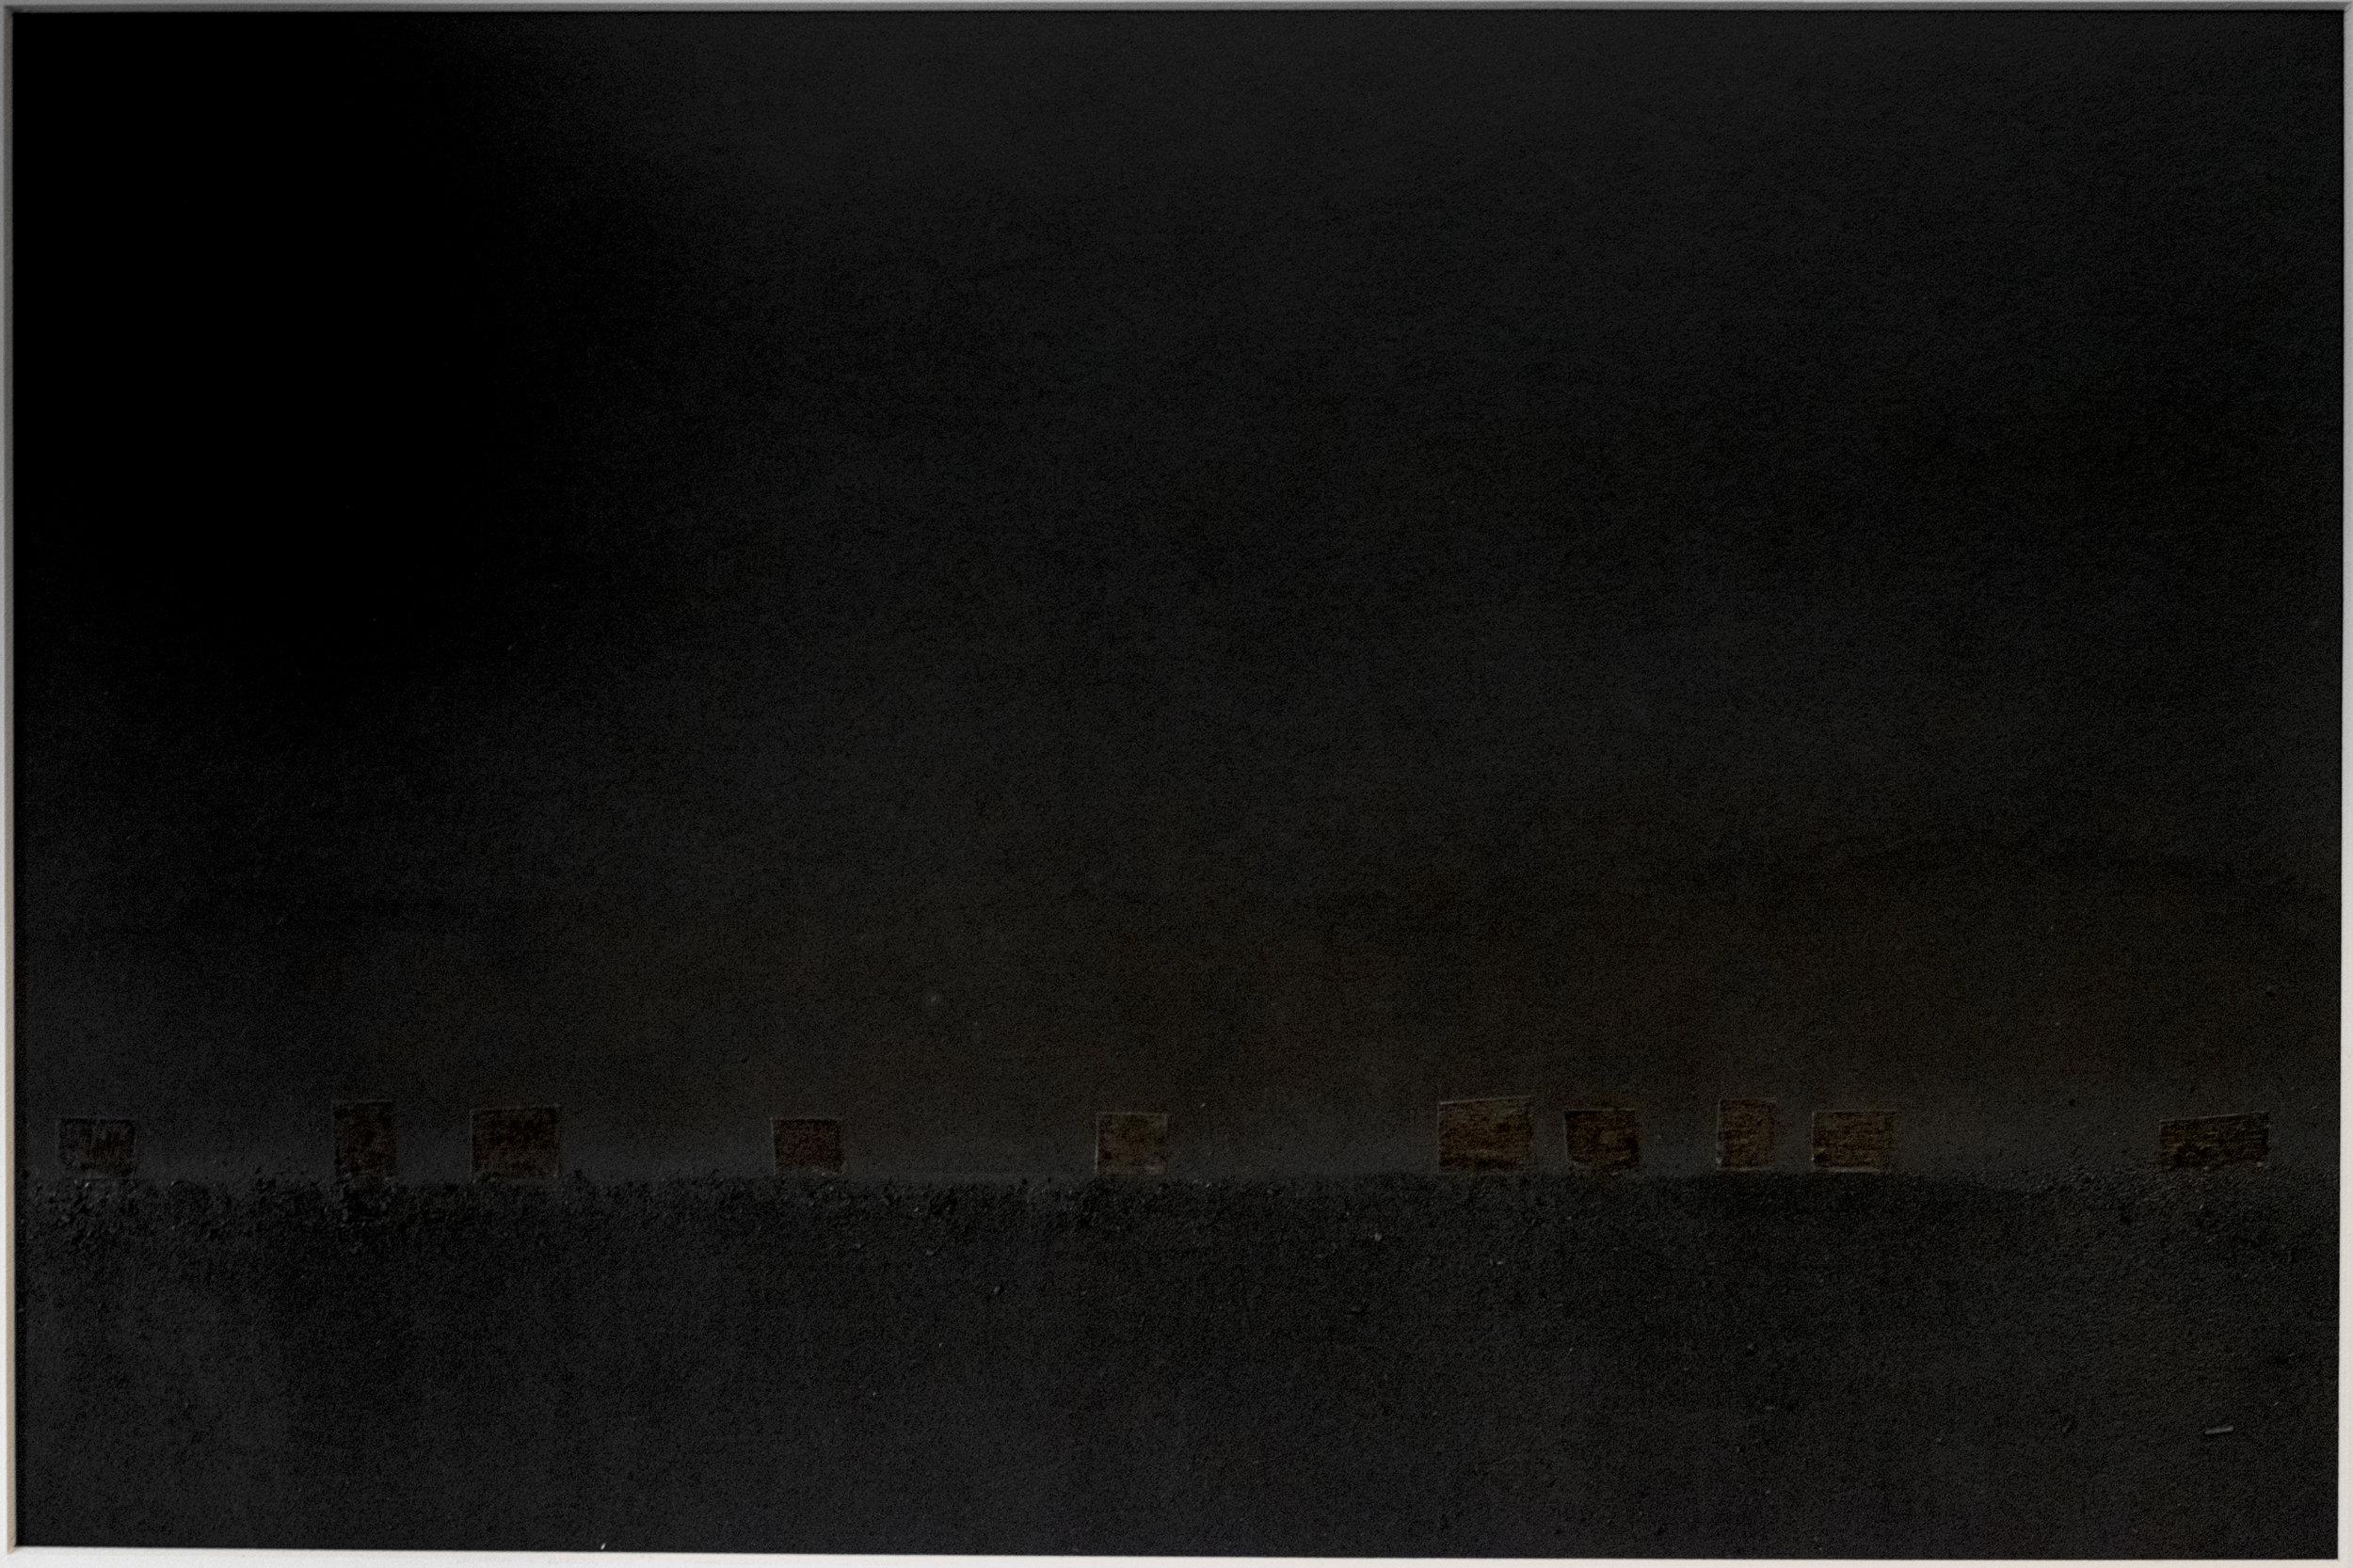 chautauqua lake at night; charcoal, graphite, and masking tape over pigment print (11x14)